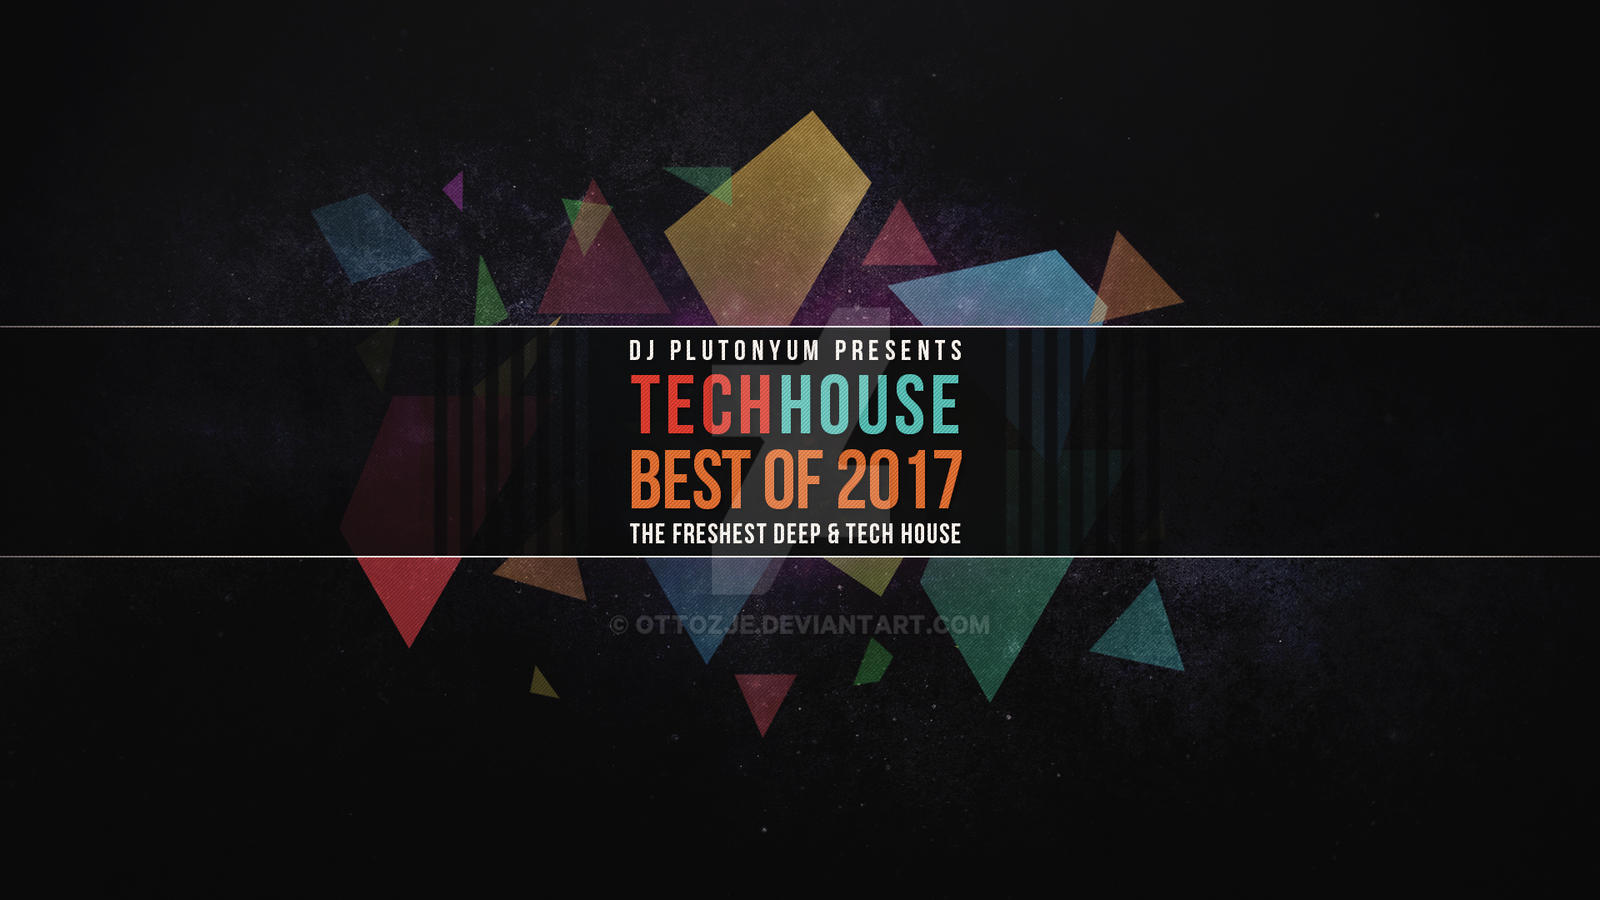 Tech House Best Of 2017 Youtube Background By Ottozje On